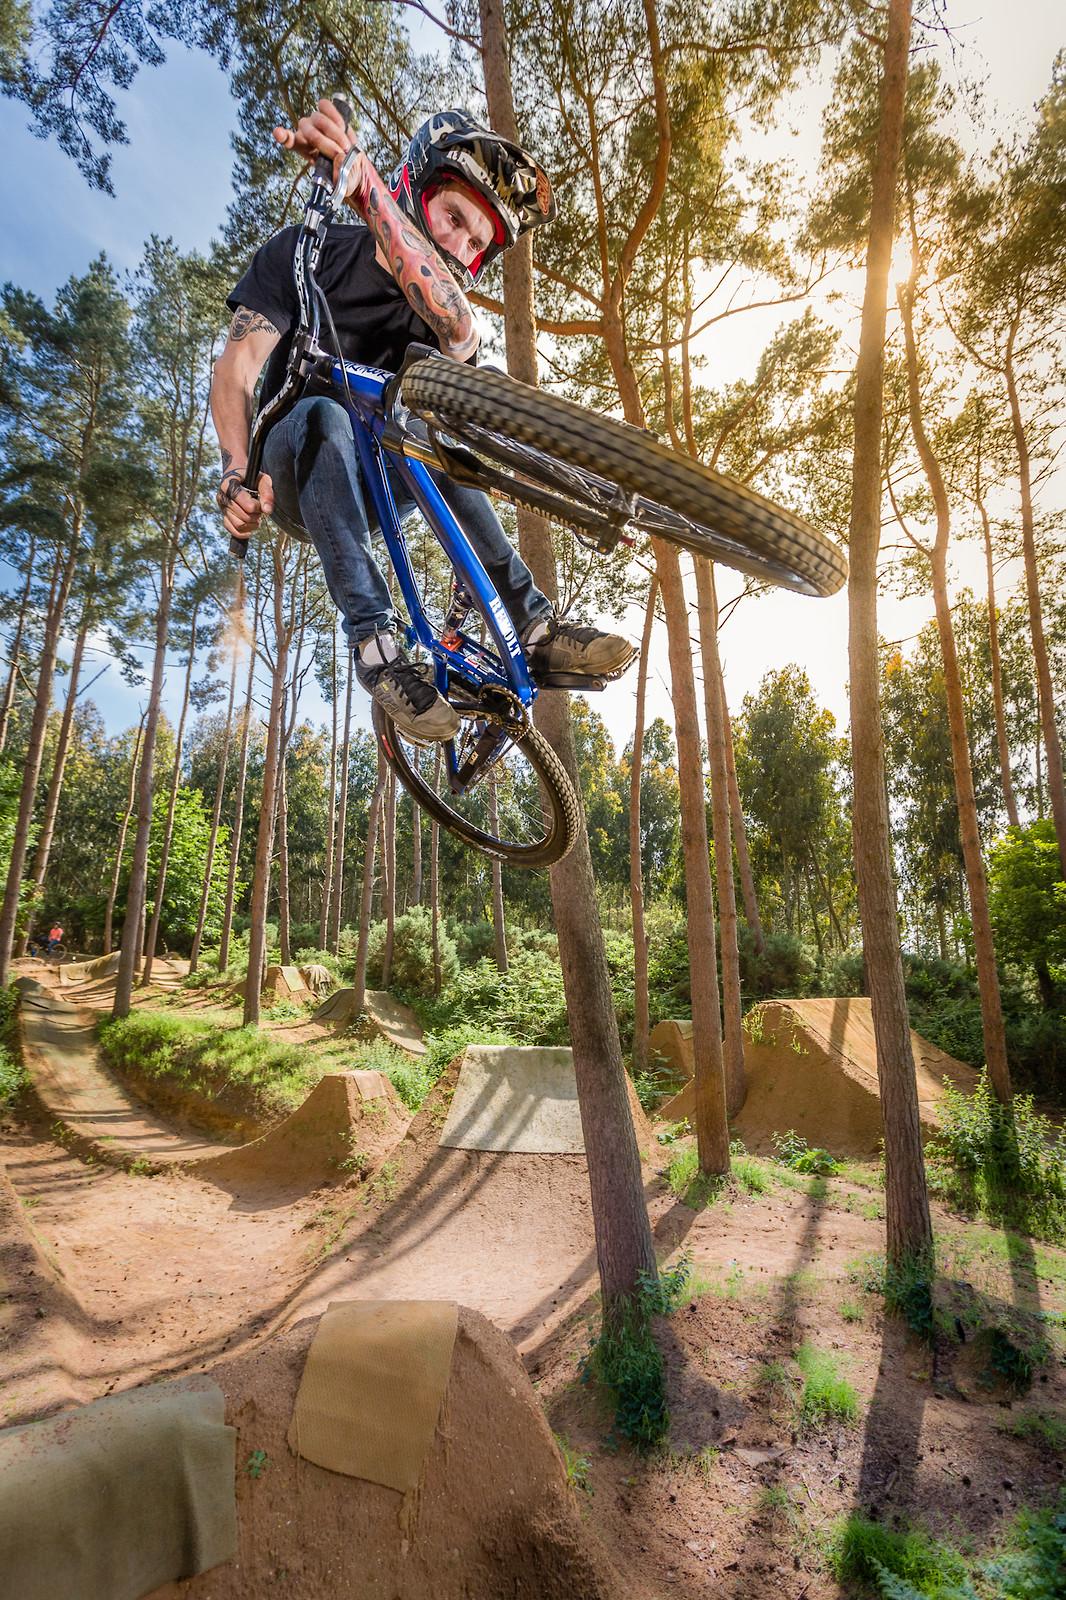 1805 SB G23-7901 - mzed - Mountain Biking Pictures - Vital MTB